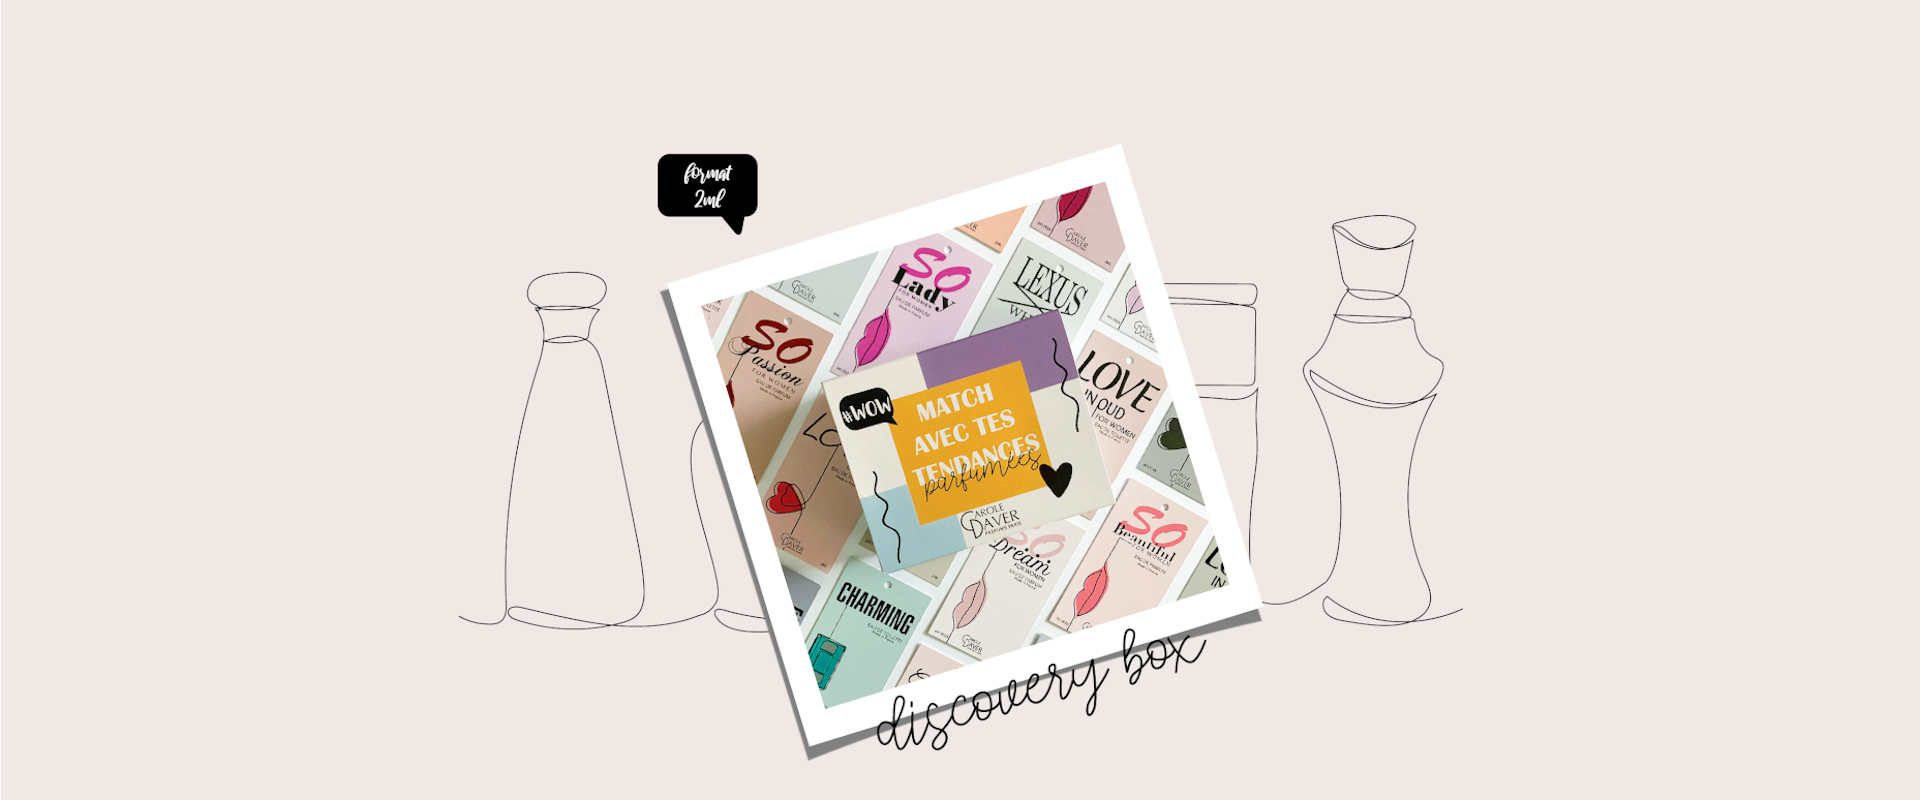 Dicovery box | Carole Daver Parfums